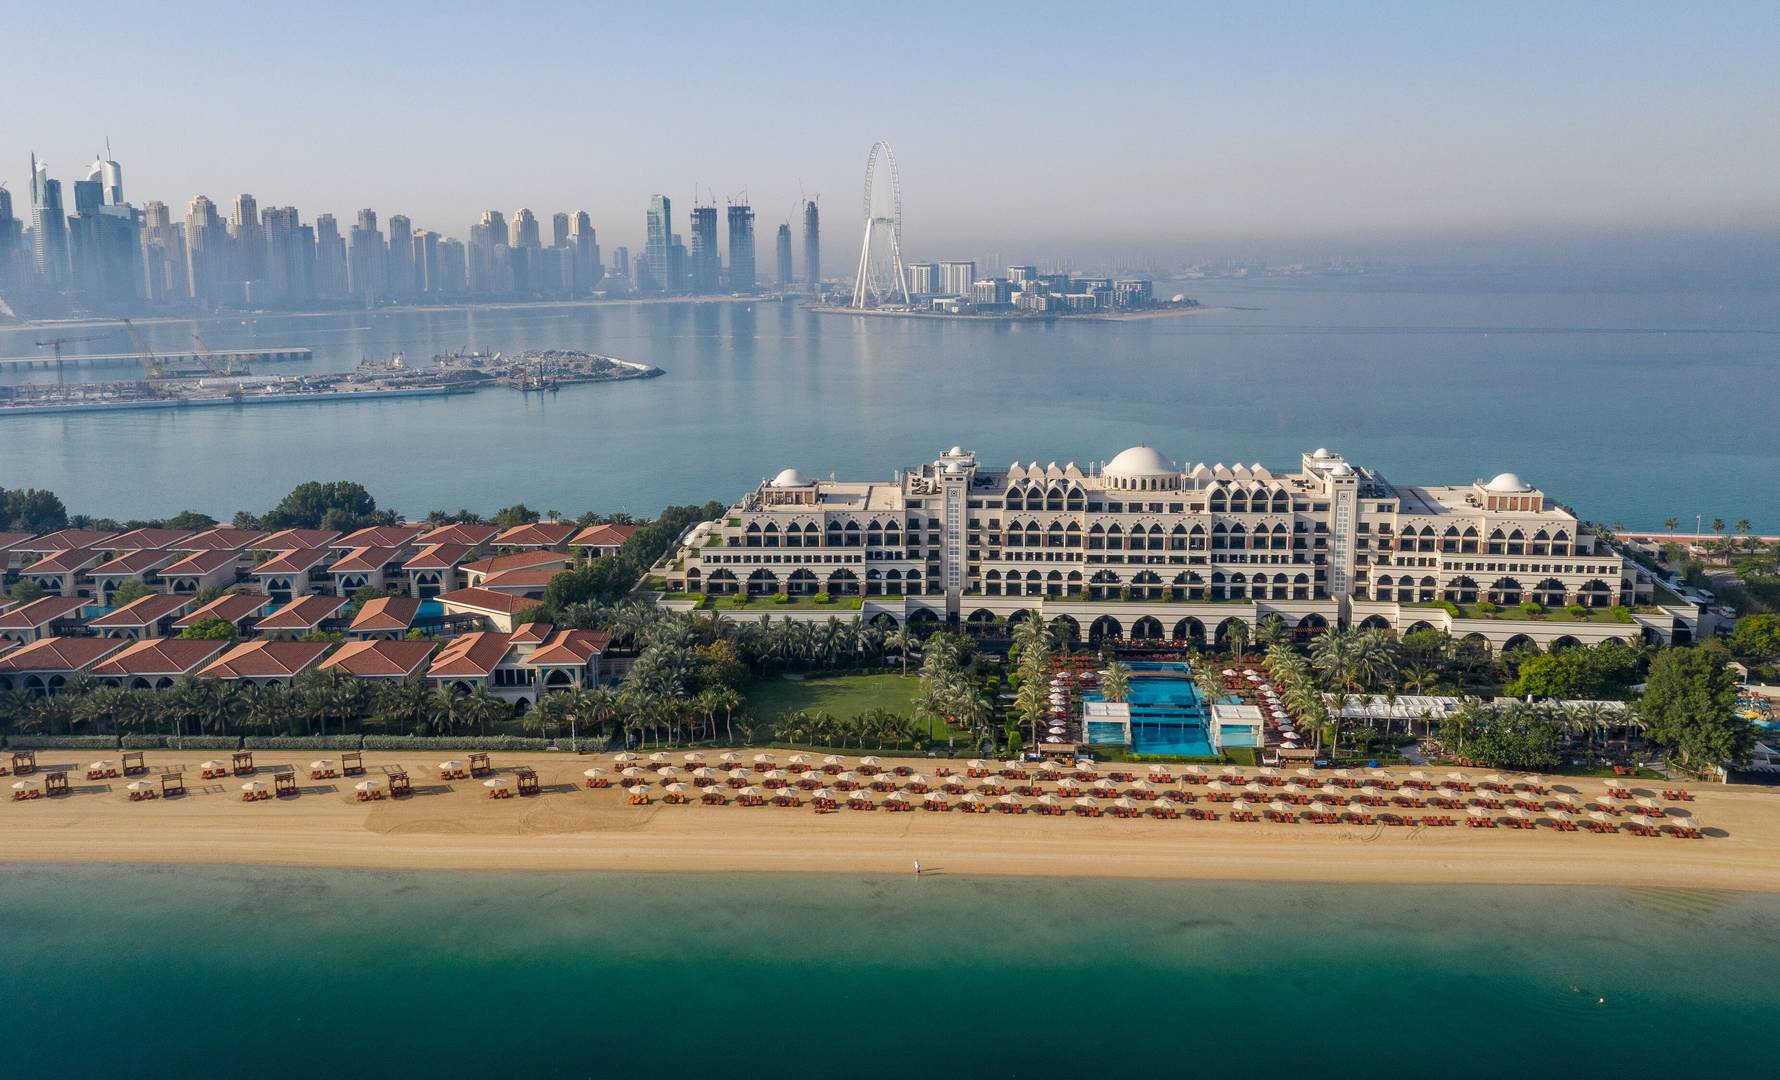 Aerial view of Jumeirah Zabeel Saray on the Palm Jumeirah in Dubai